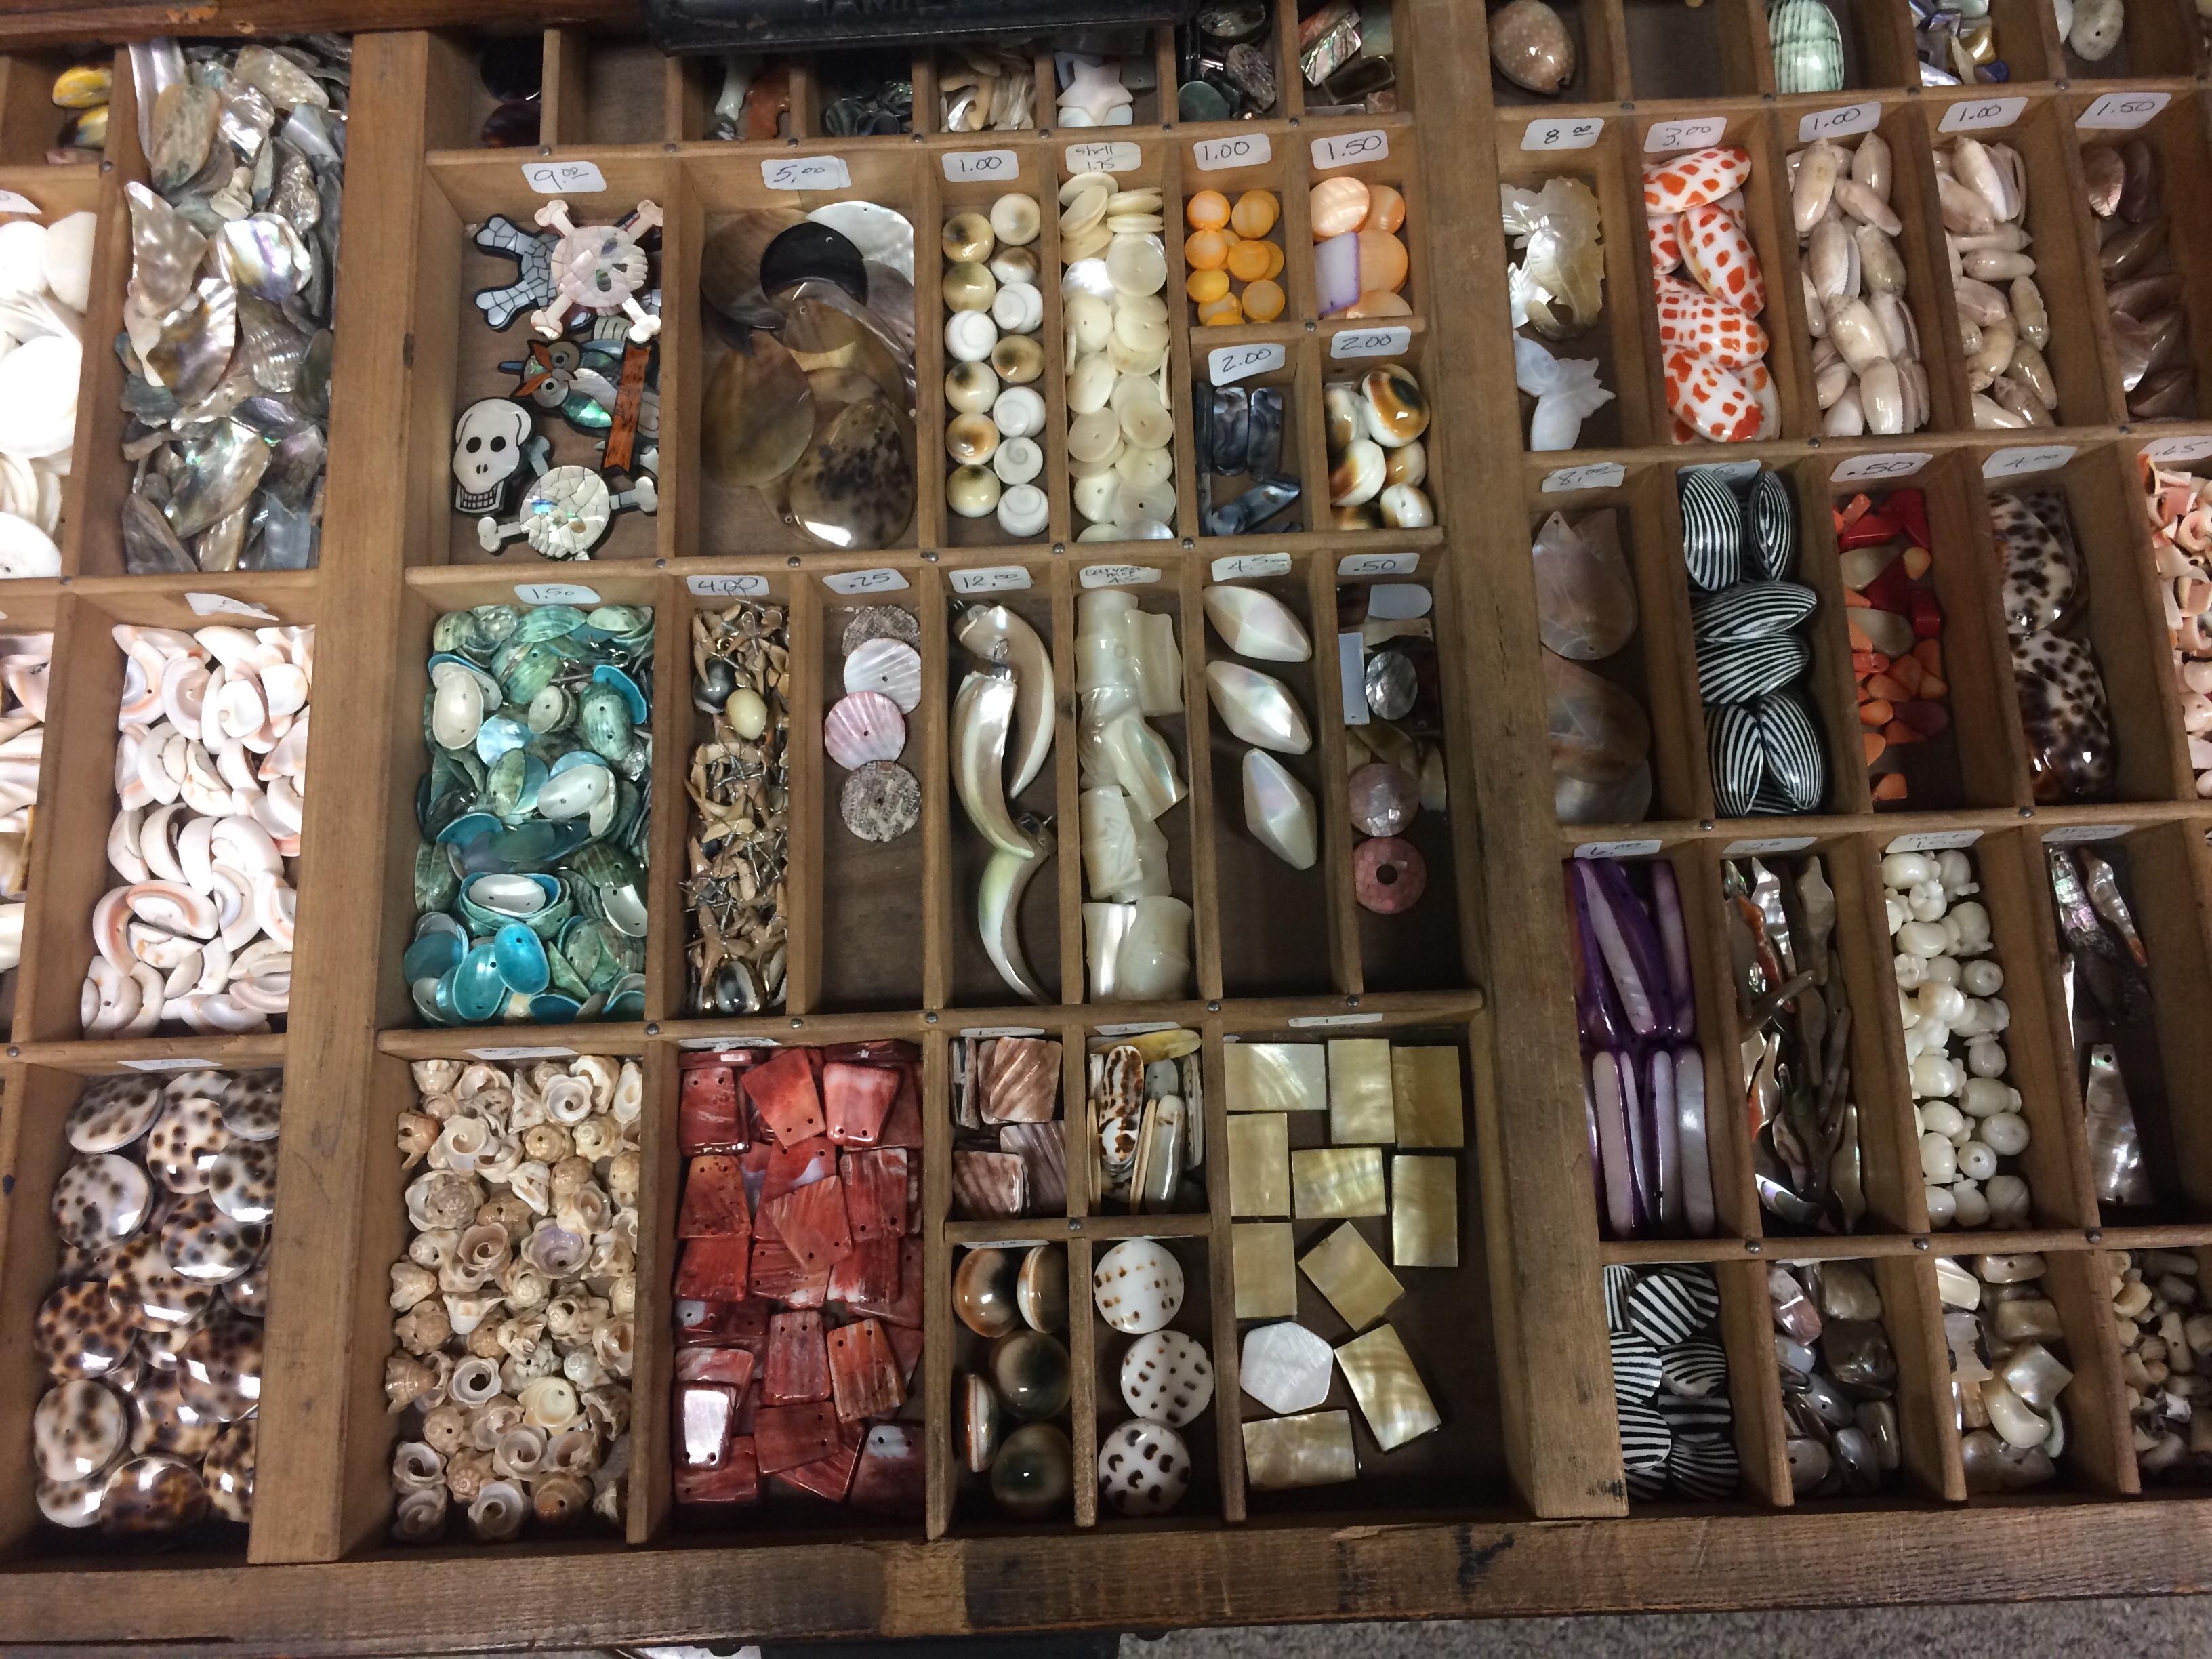 Thousands of loose beads